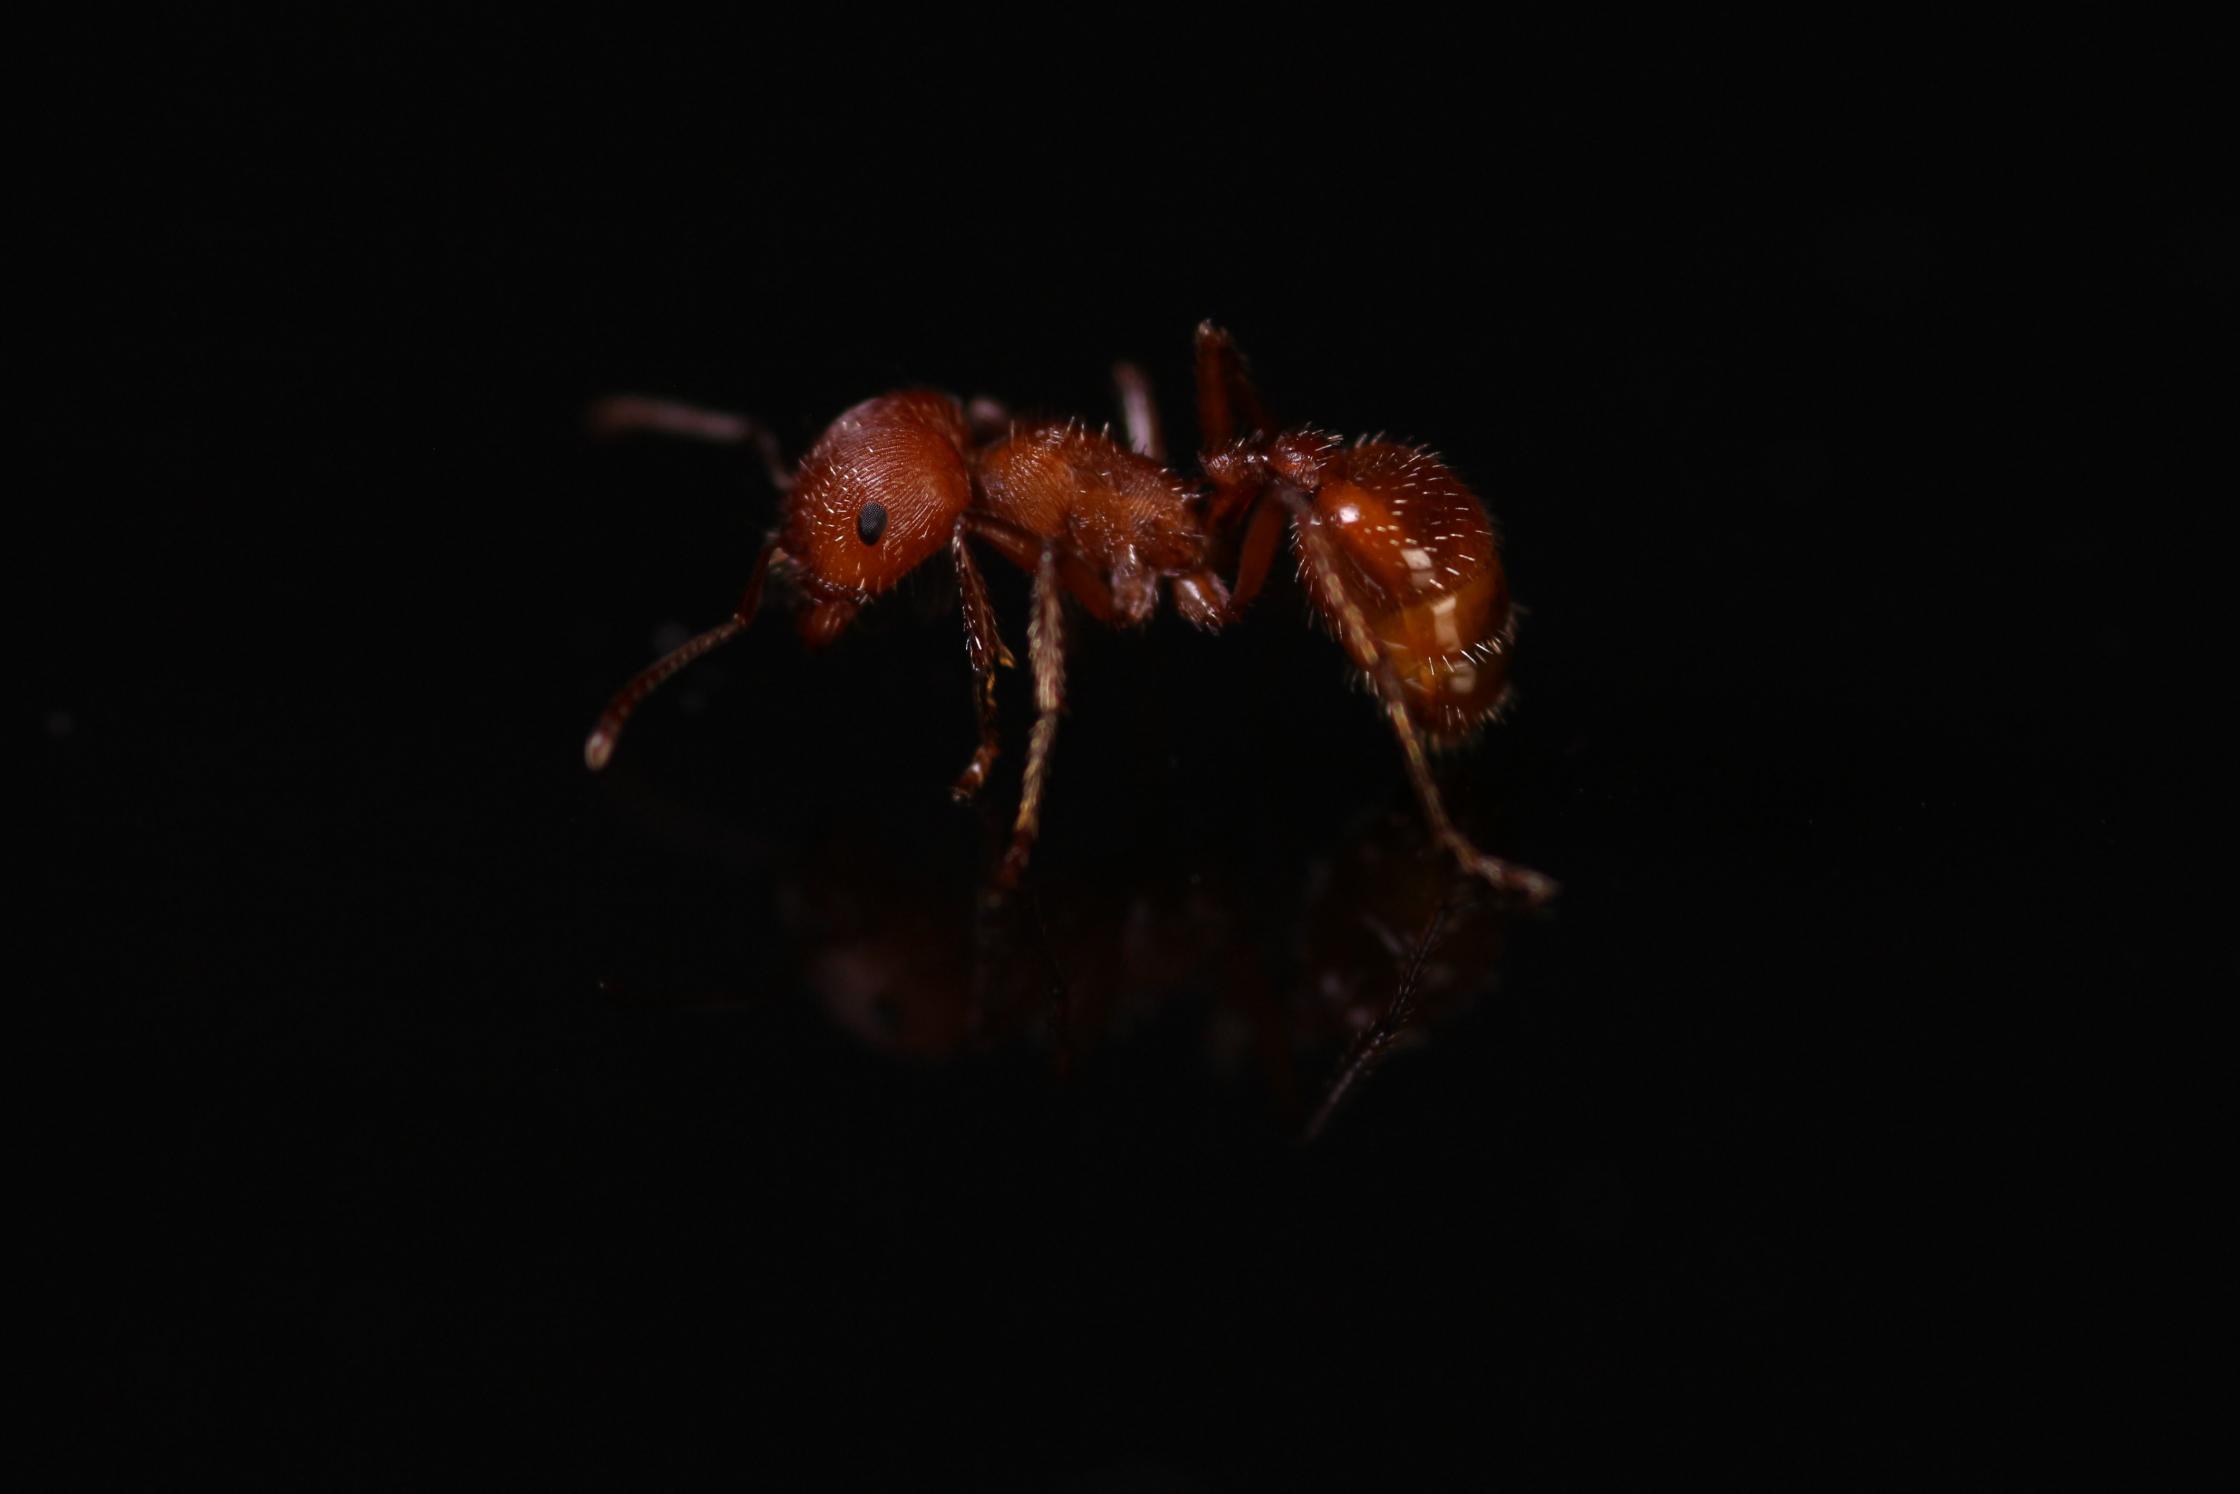 Ants4fun's Photo